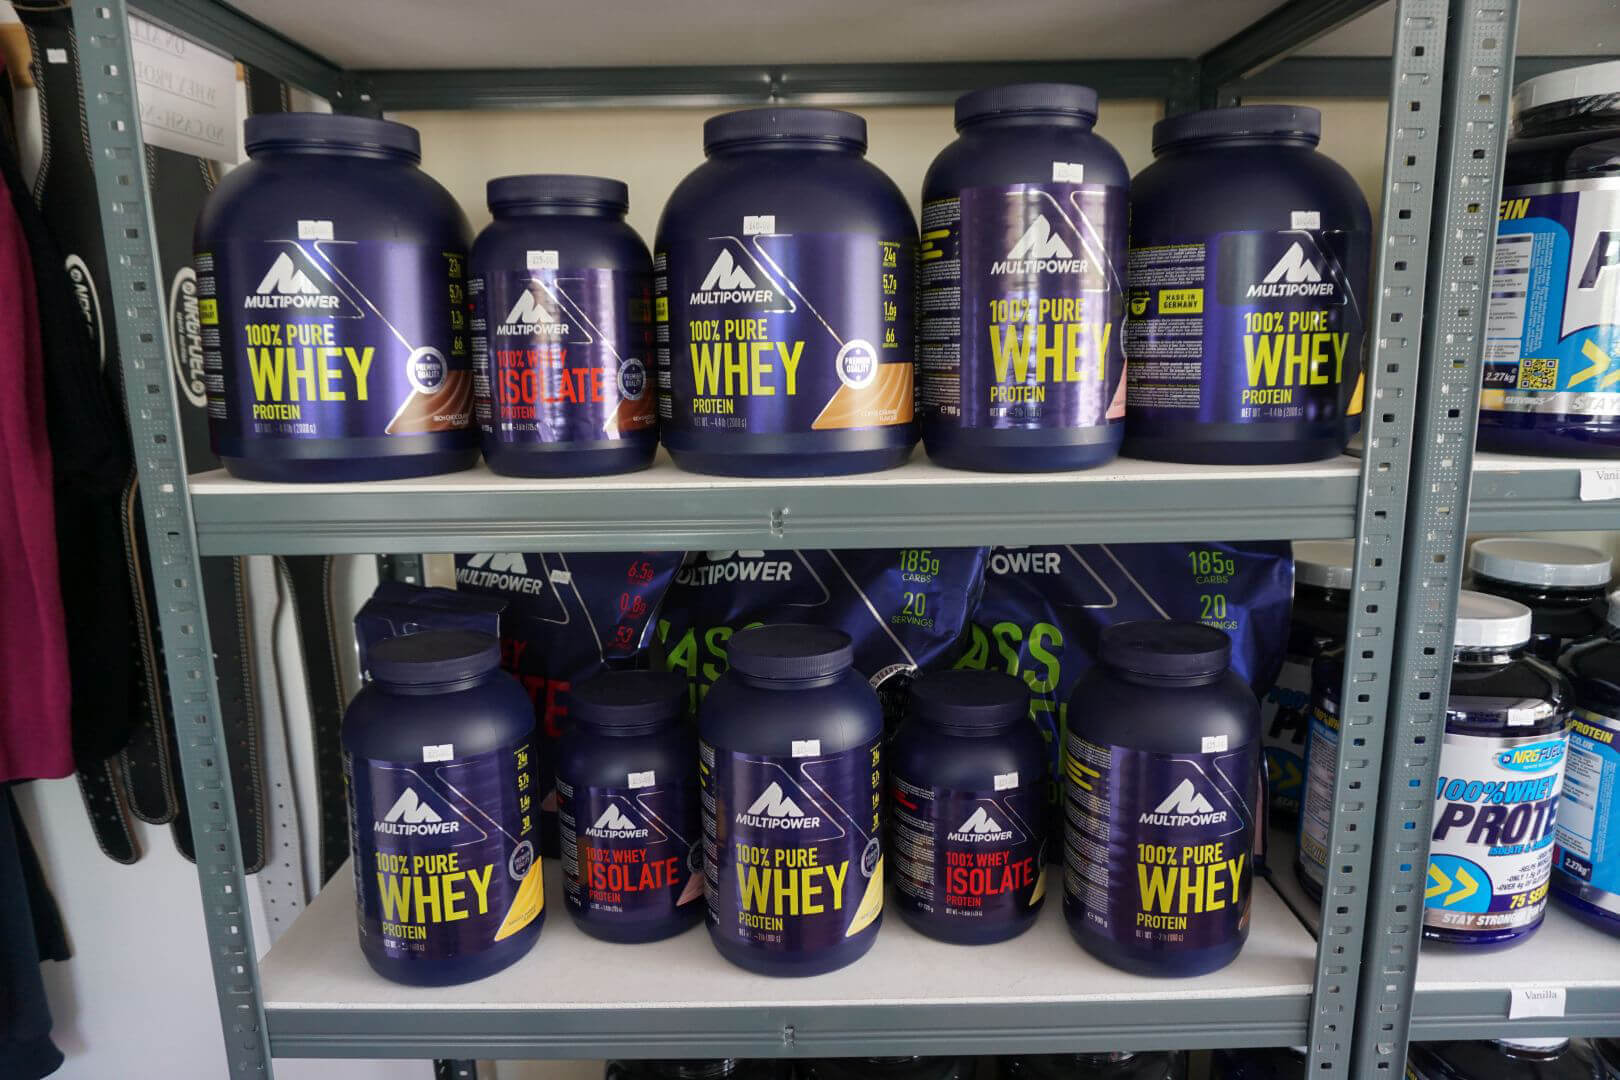 Fitta bodies gym whey protein multi power